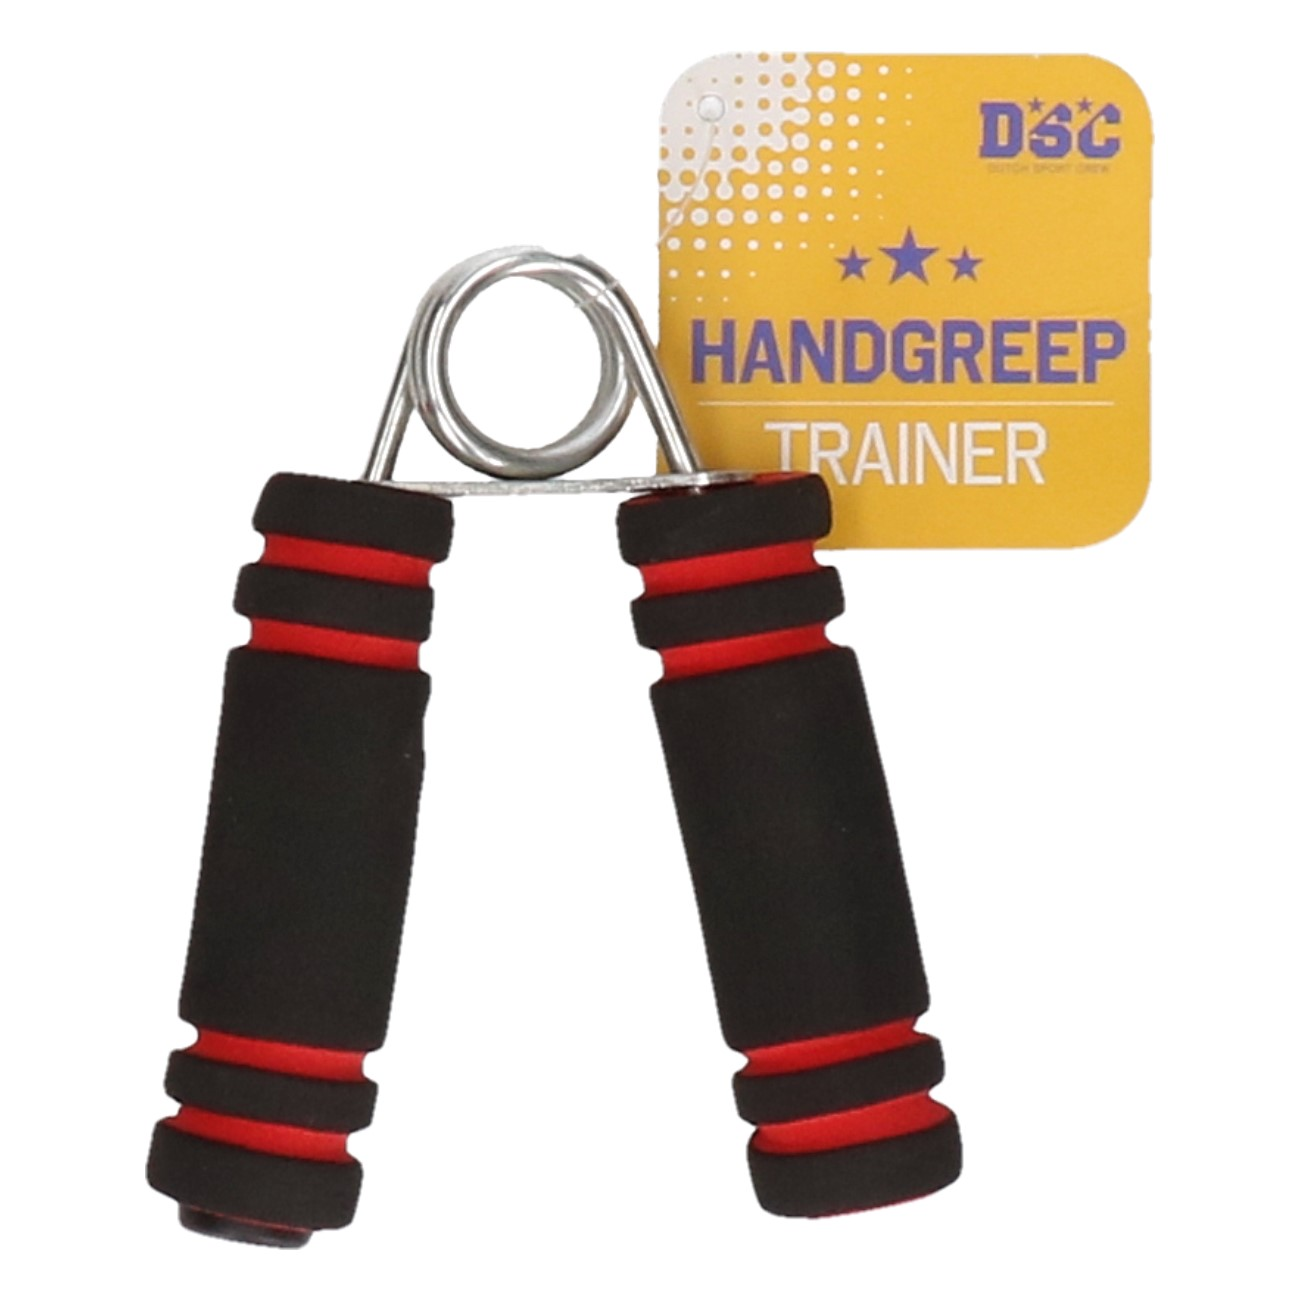 Handgreep trainer